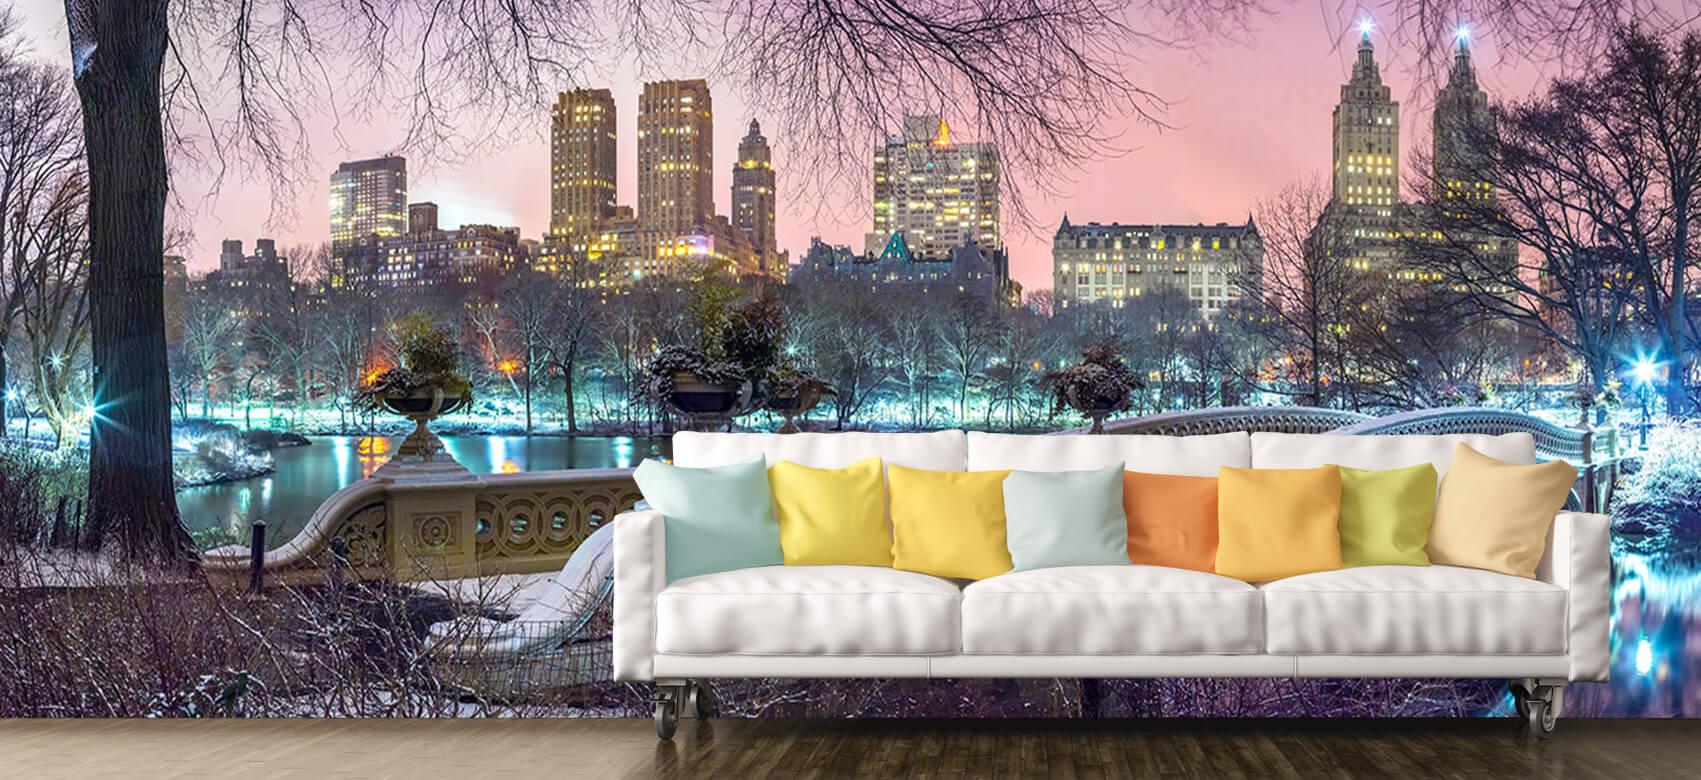 Colourful Central Park 6